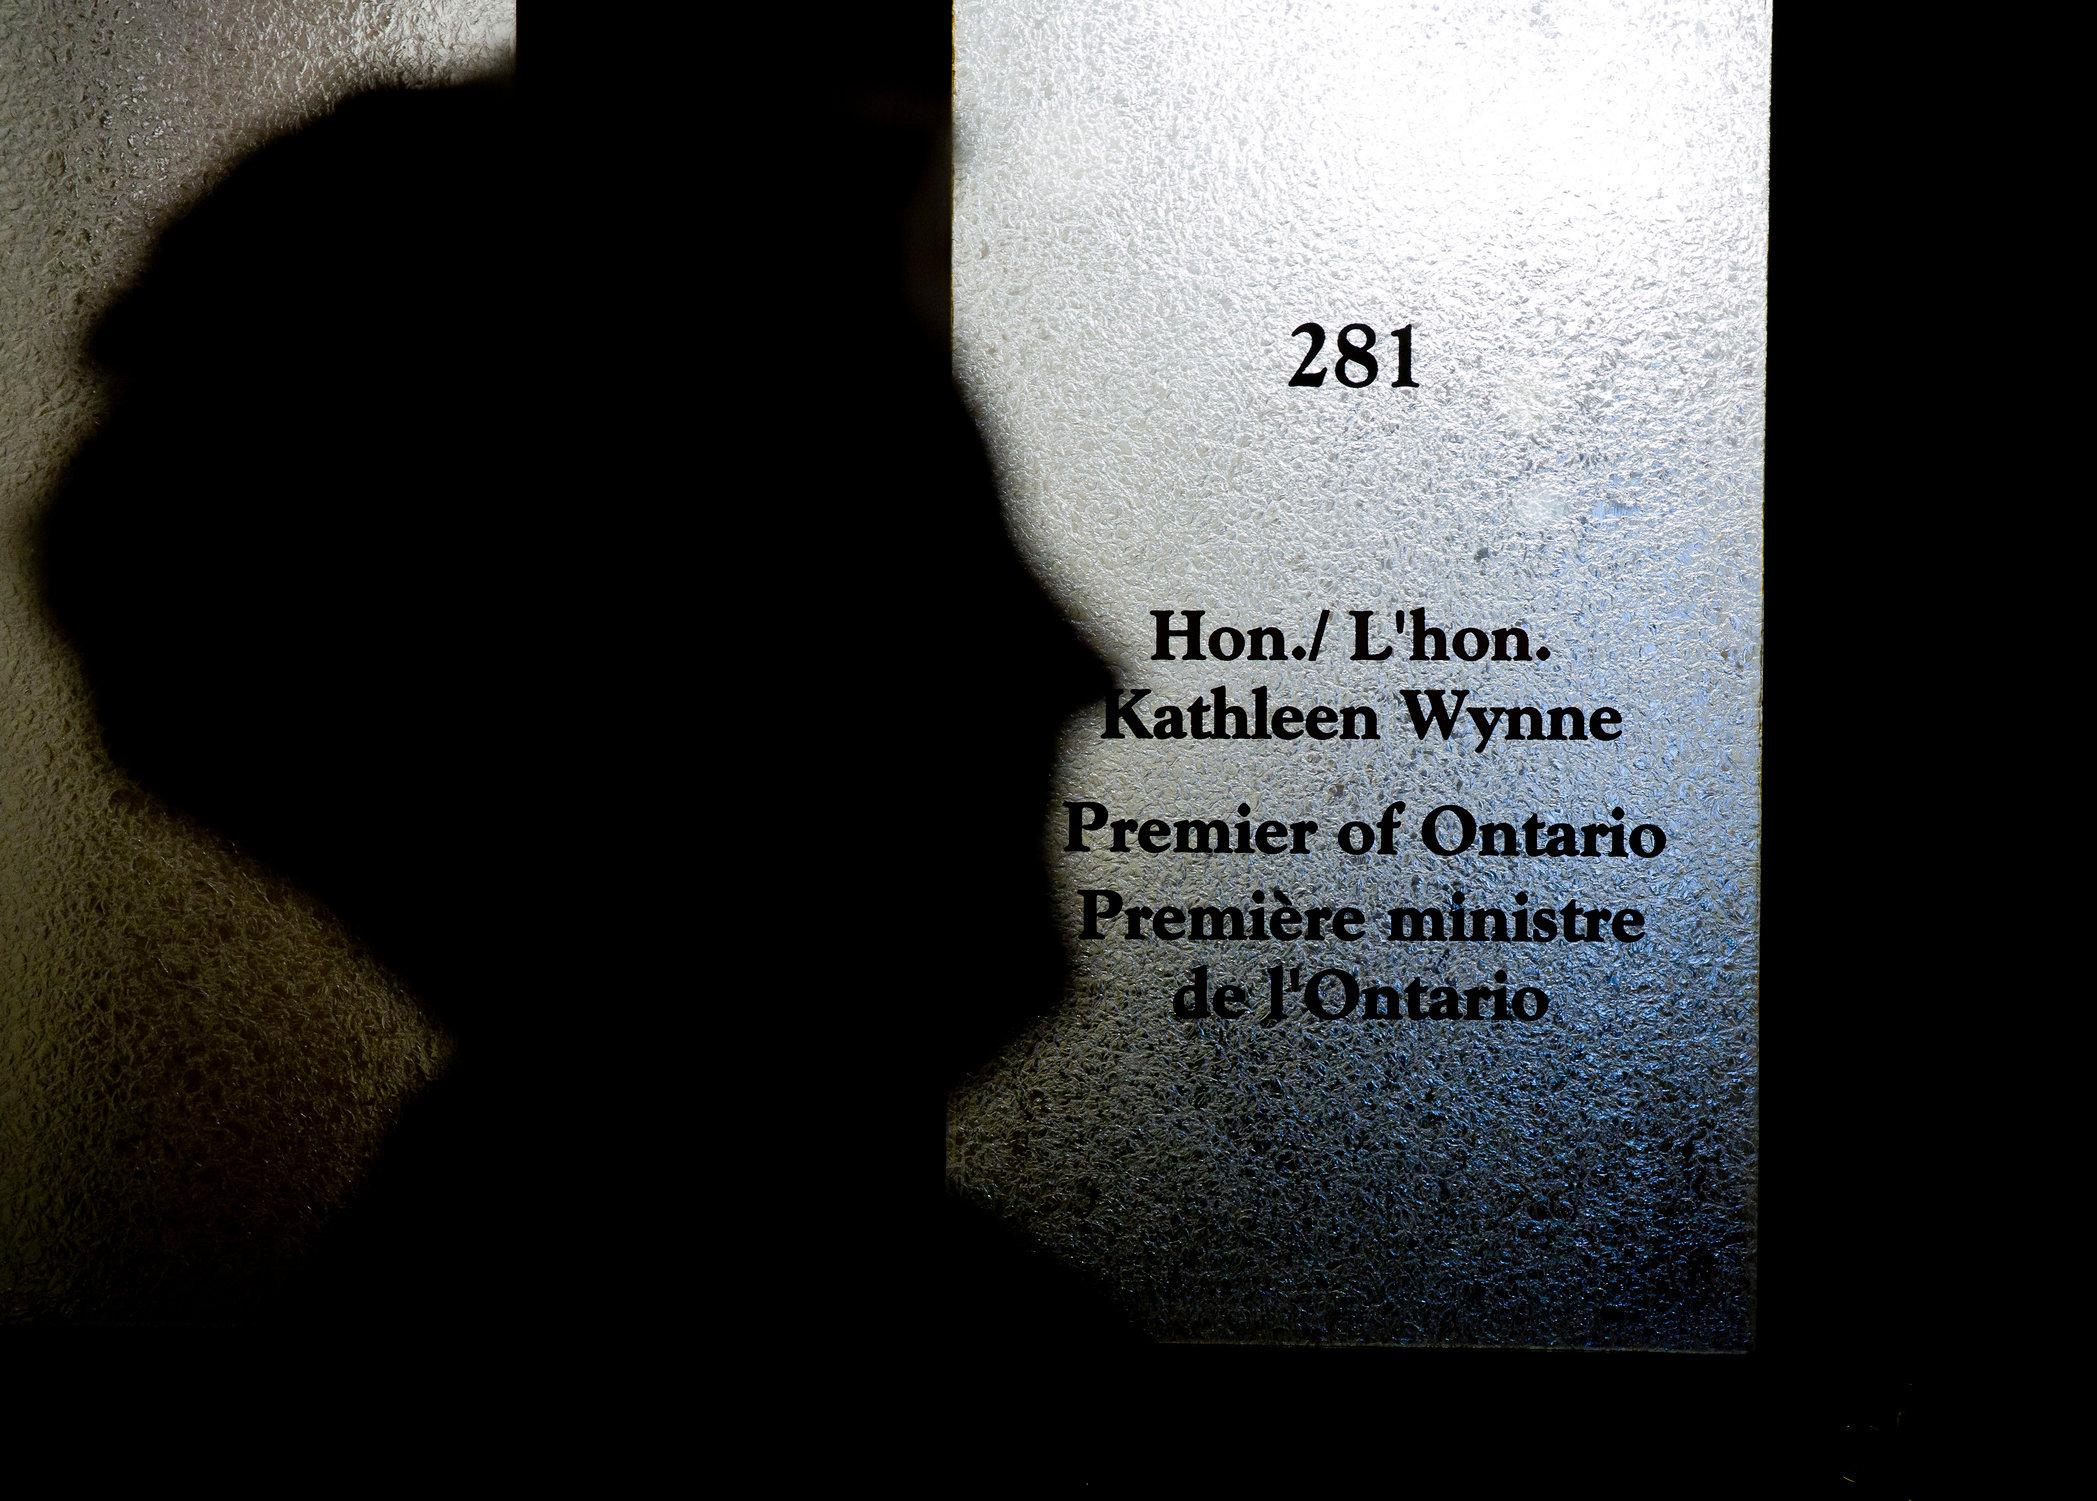 070_Kathleen_Wynne_Election.JPG